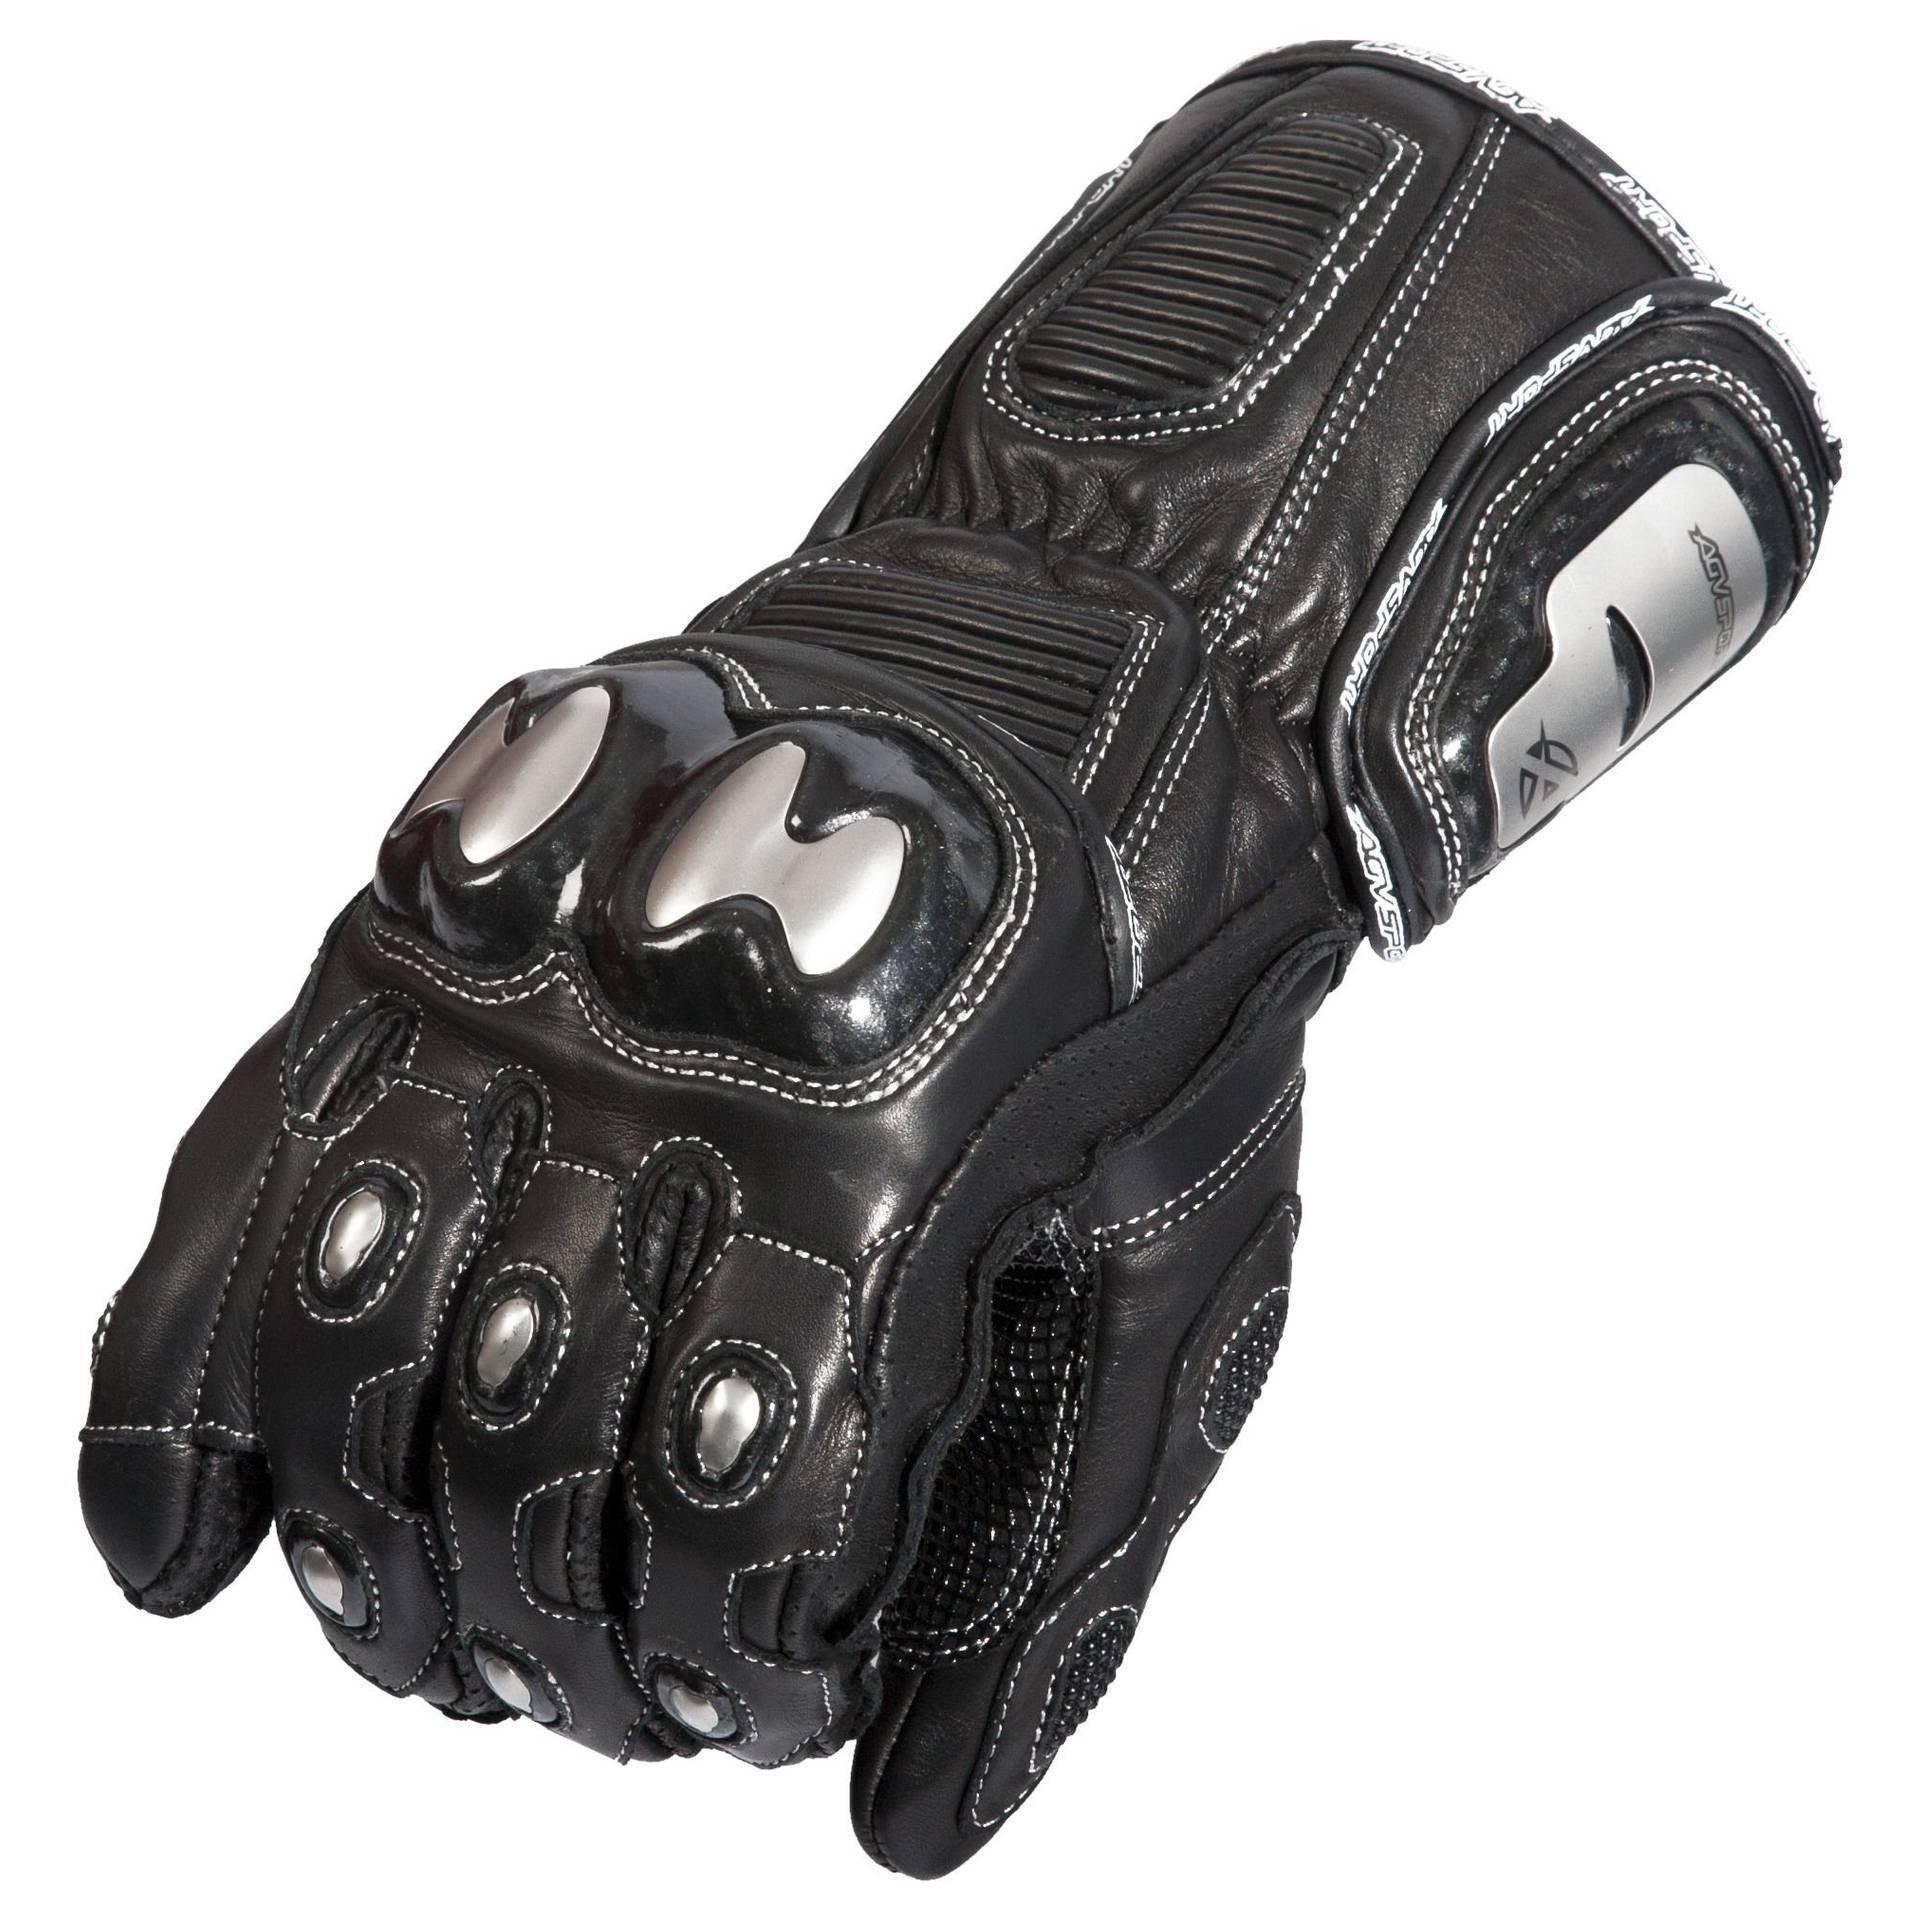 AGV Sport Echelon Gloves - Black - Medium